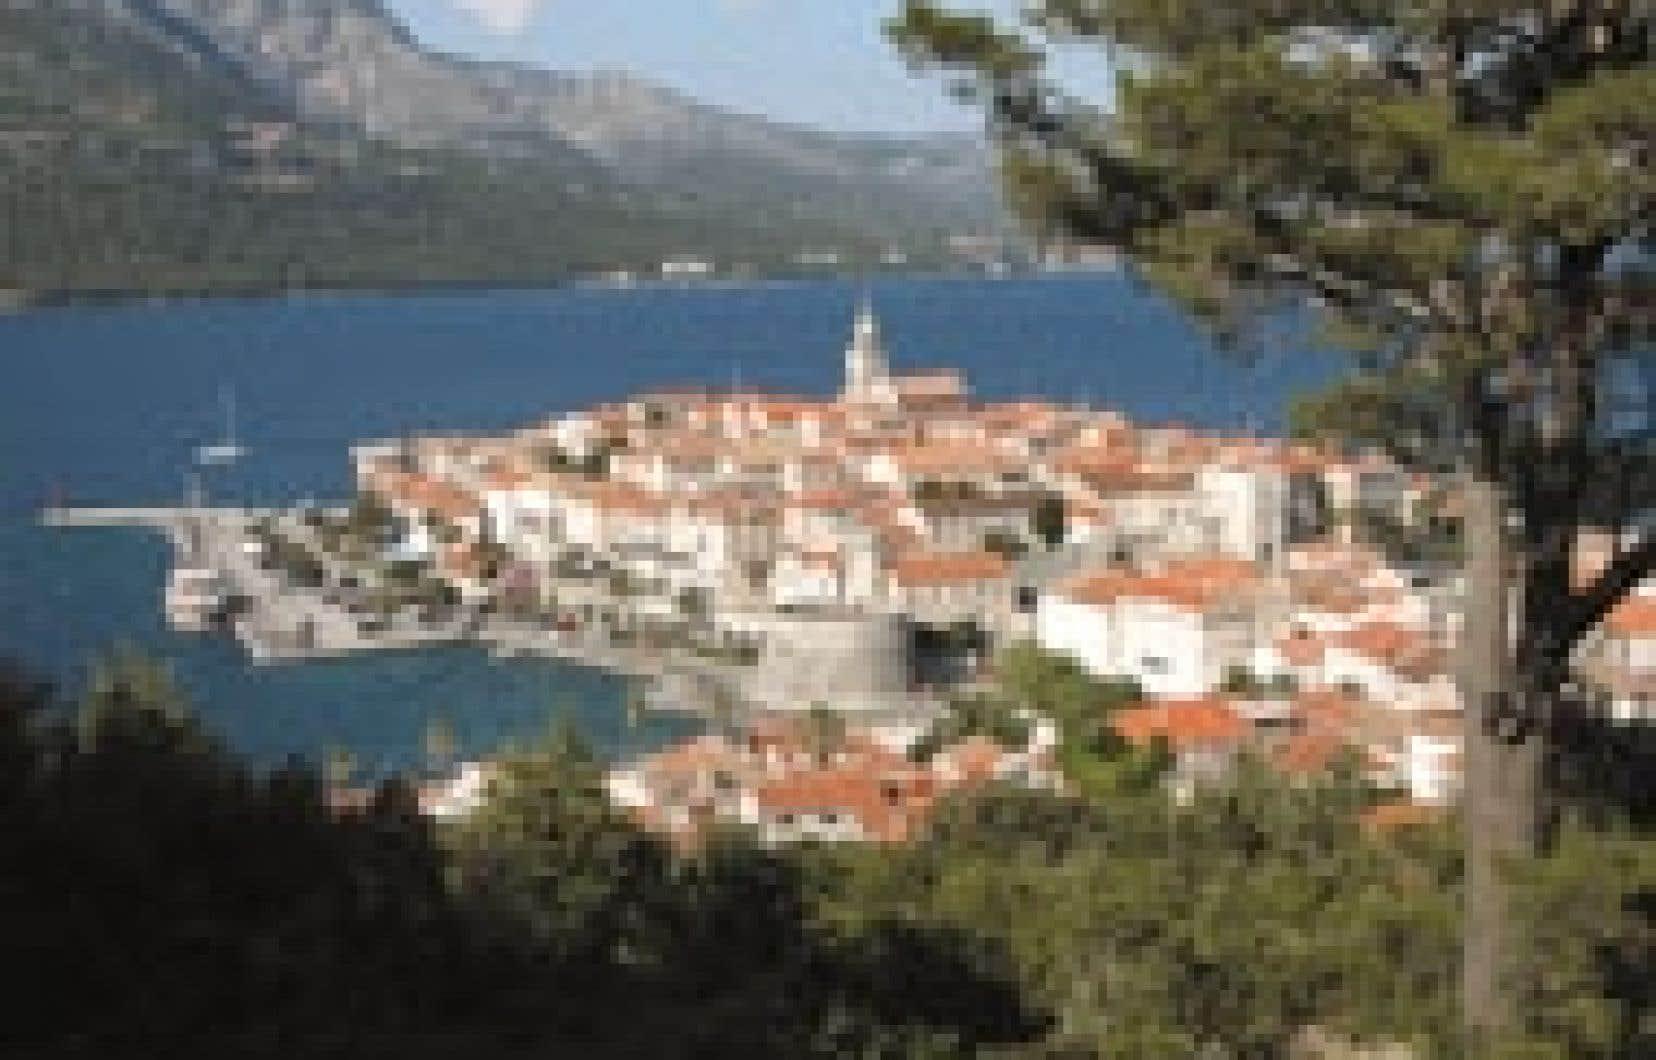 Source Lio Kiefer Korcula, une petite île en face de Dubrovnik.